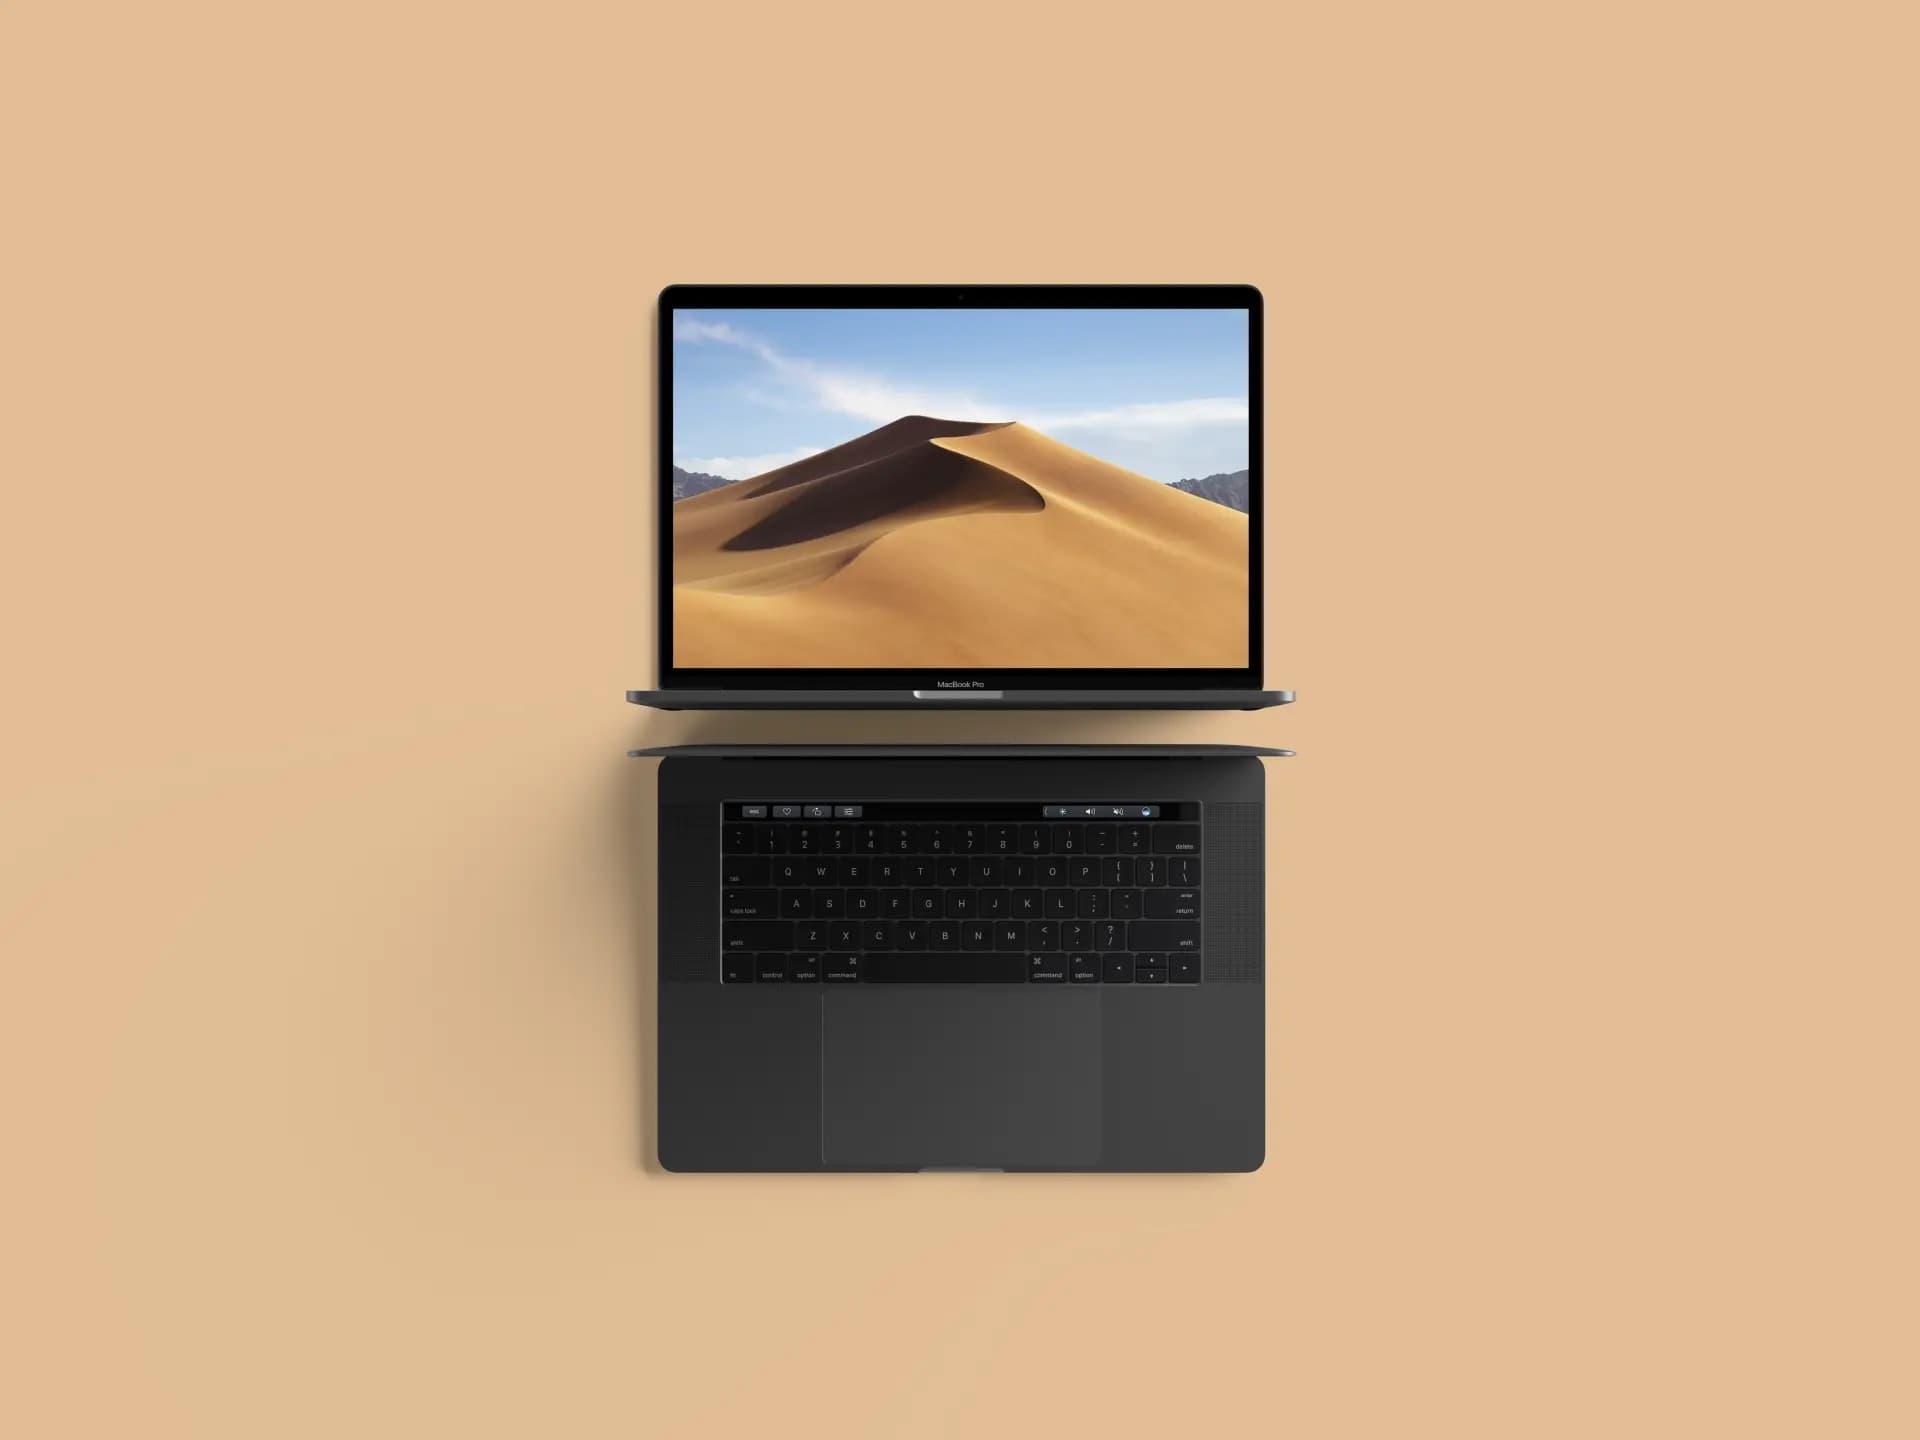 Free Top View MacBook Pro PSD Mockup